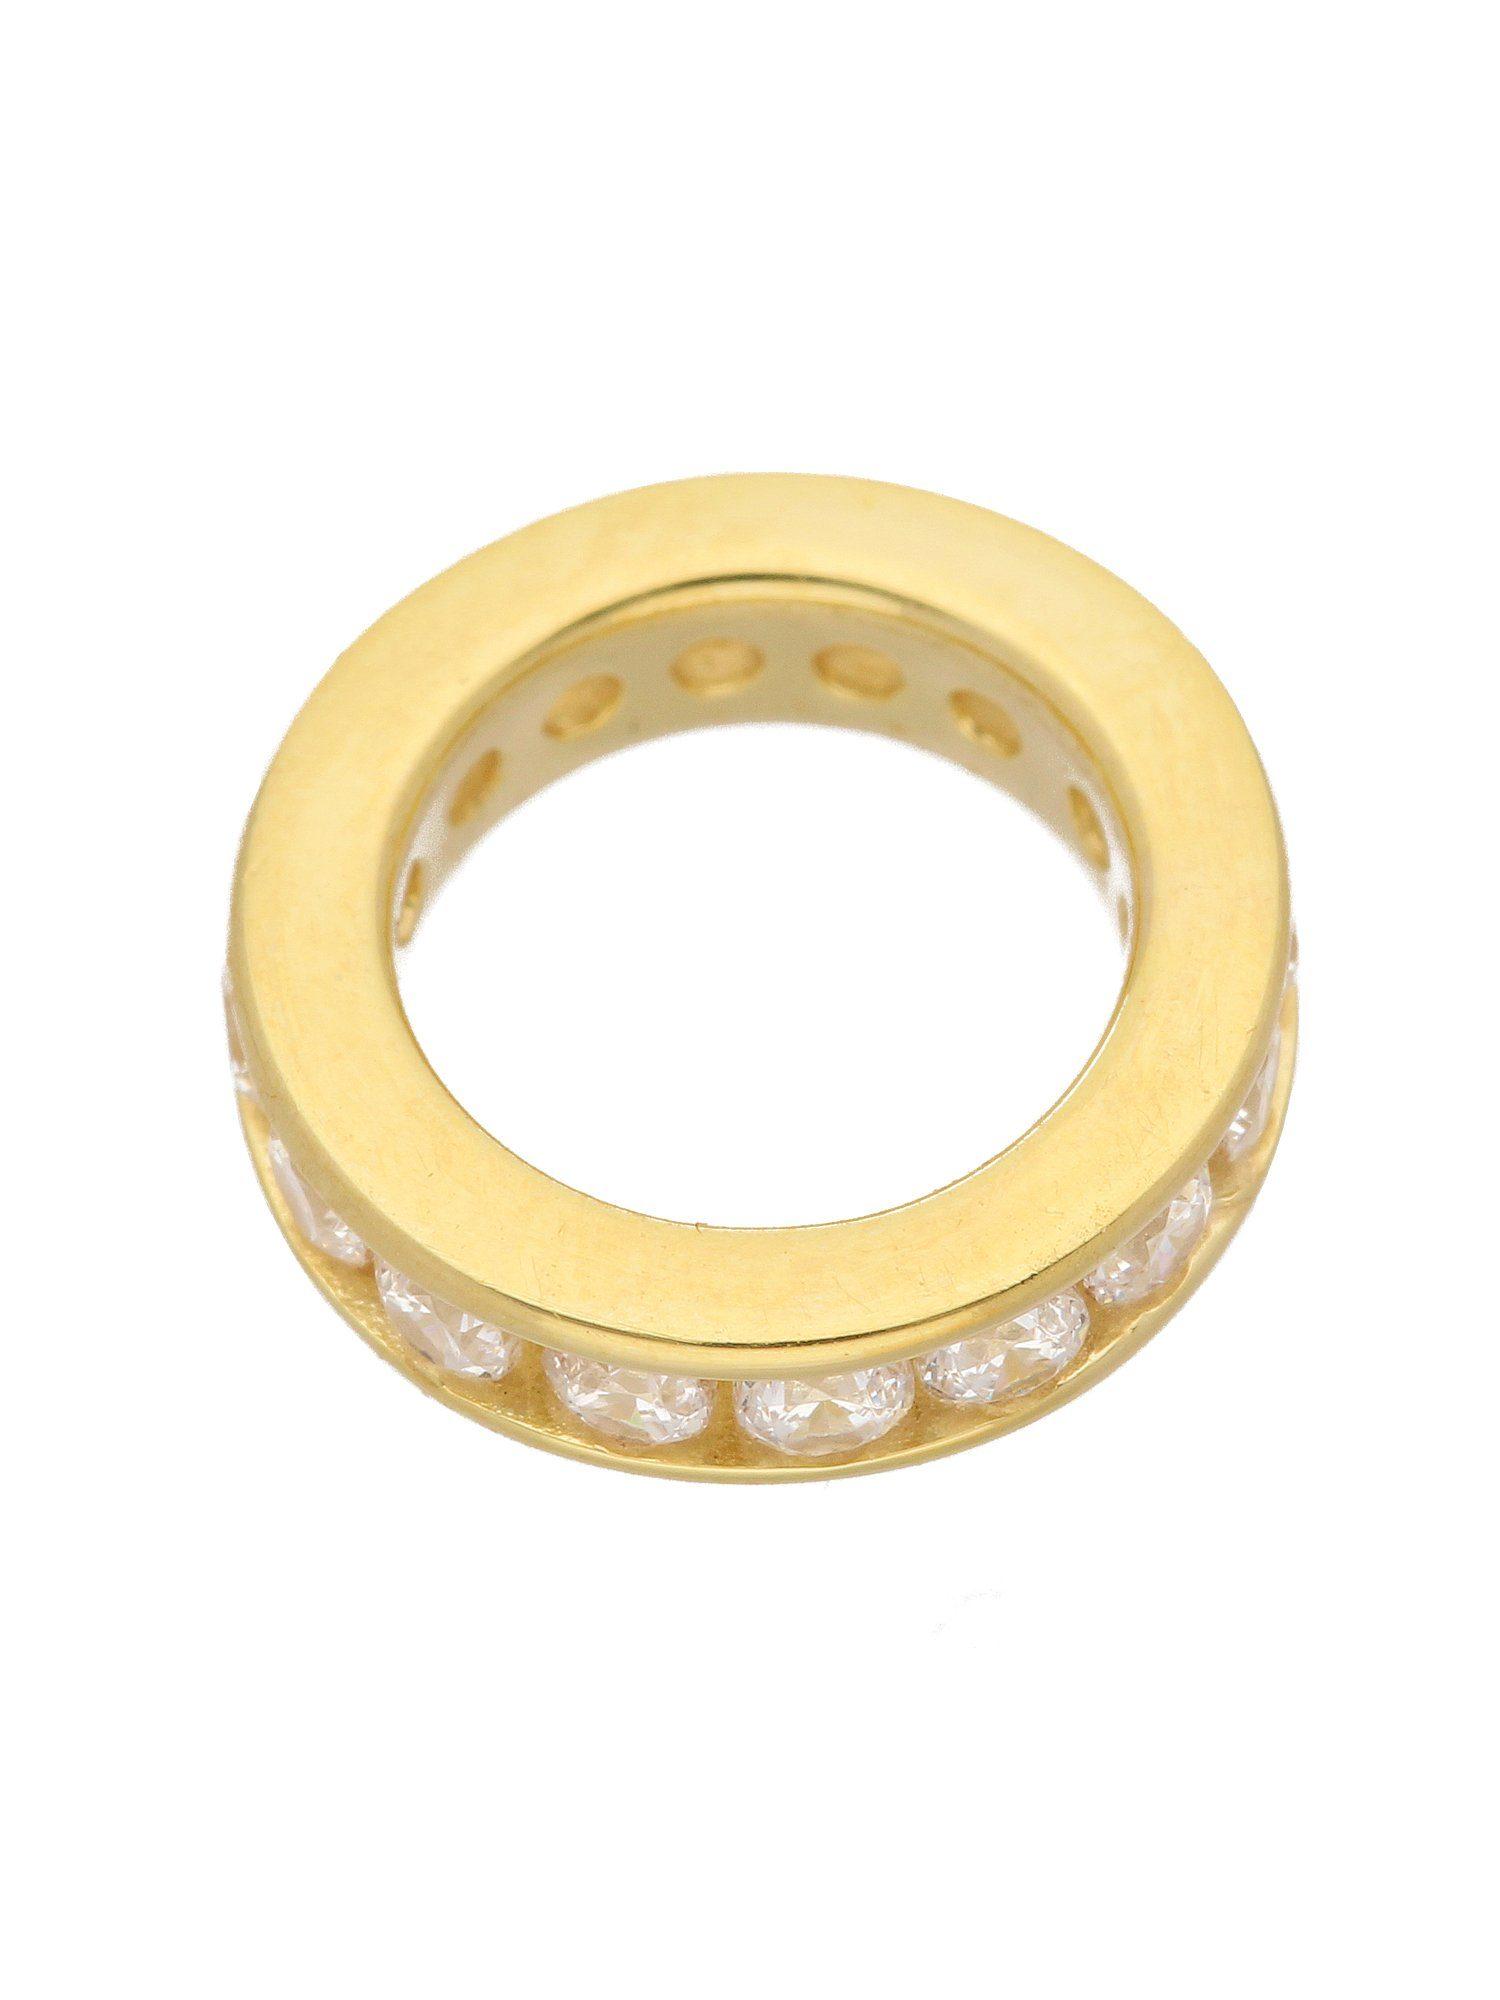 Adelia´s Kettenanhänger »Gold 14 k (585) Motiv - Anhänger« Taufring 14 k 585 Gelbgold mit Zirkonia Ø 1.24 cm